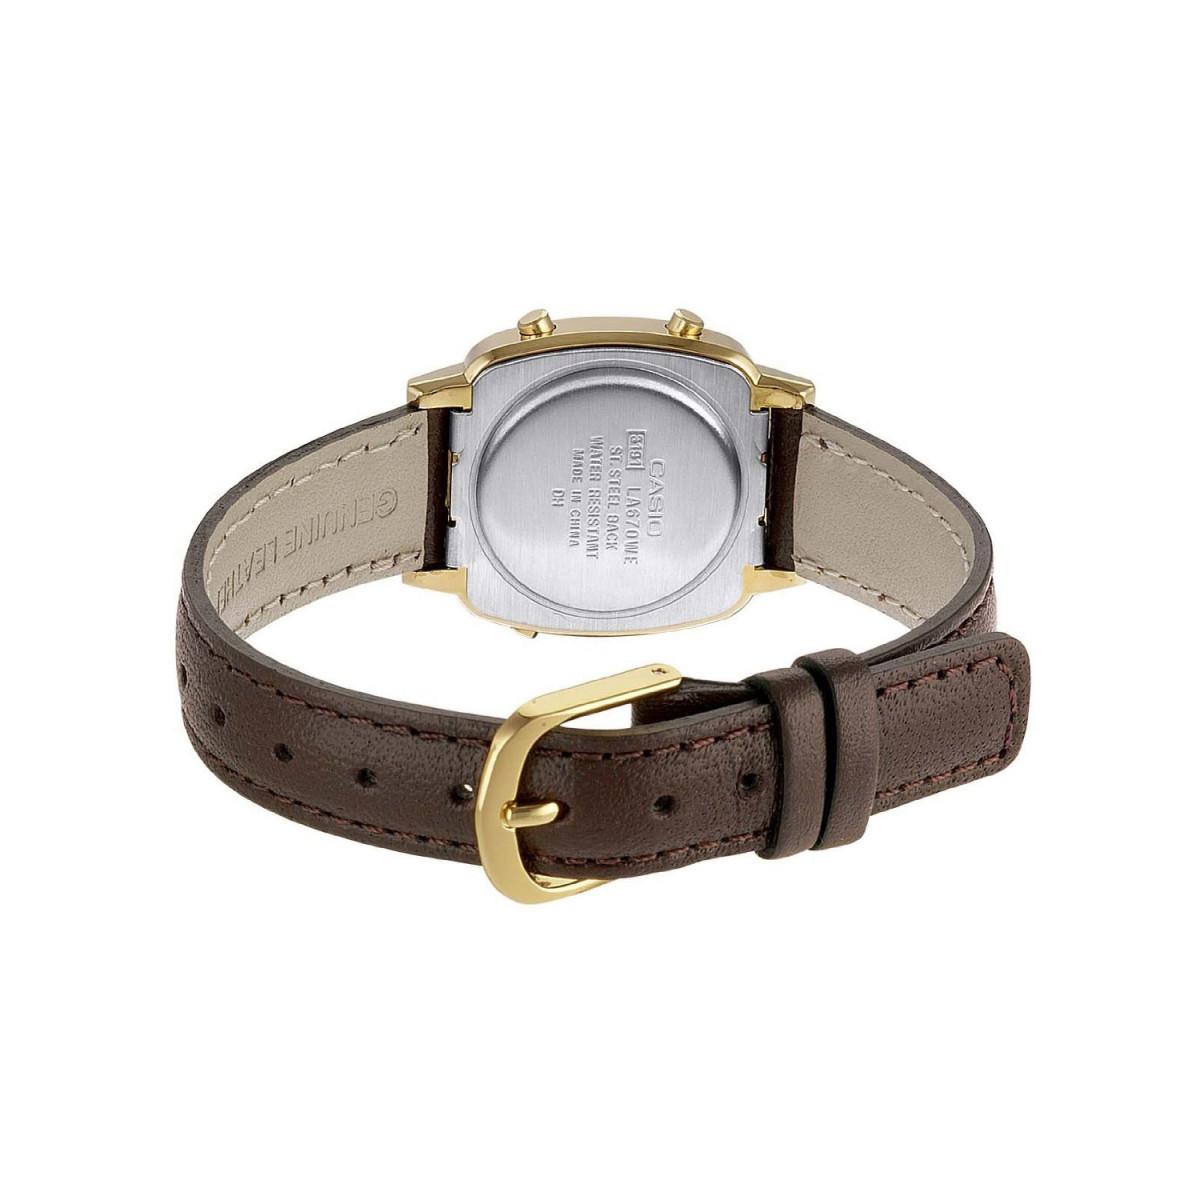 montre femme casio bracelet cuir marron la670wegl 9ef mes. Black Bedroom Furniture Sets. Home Design Ideas